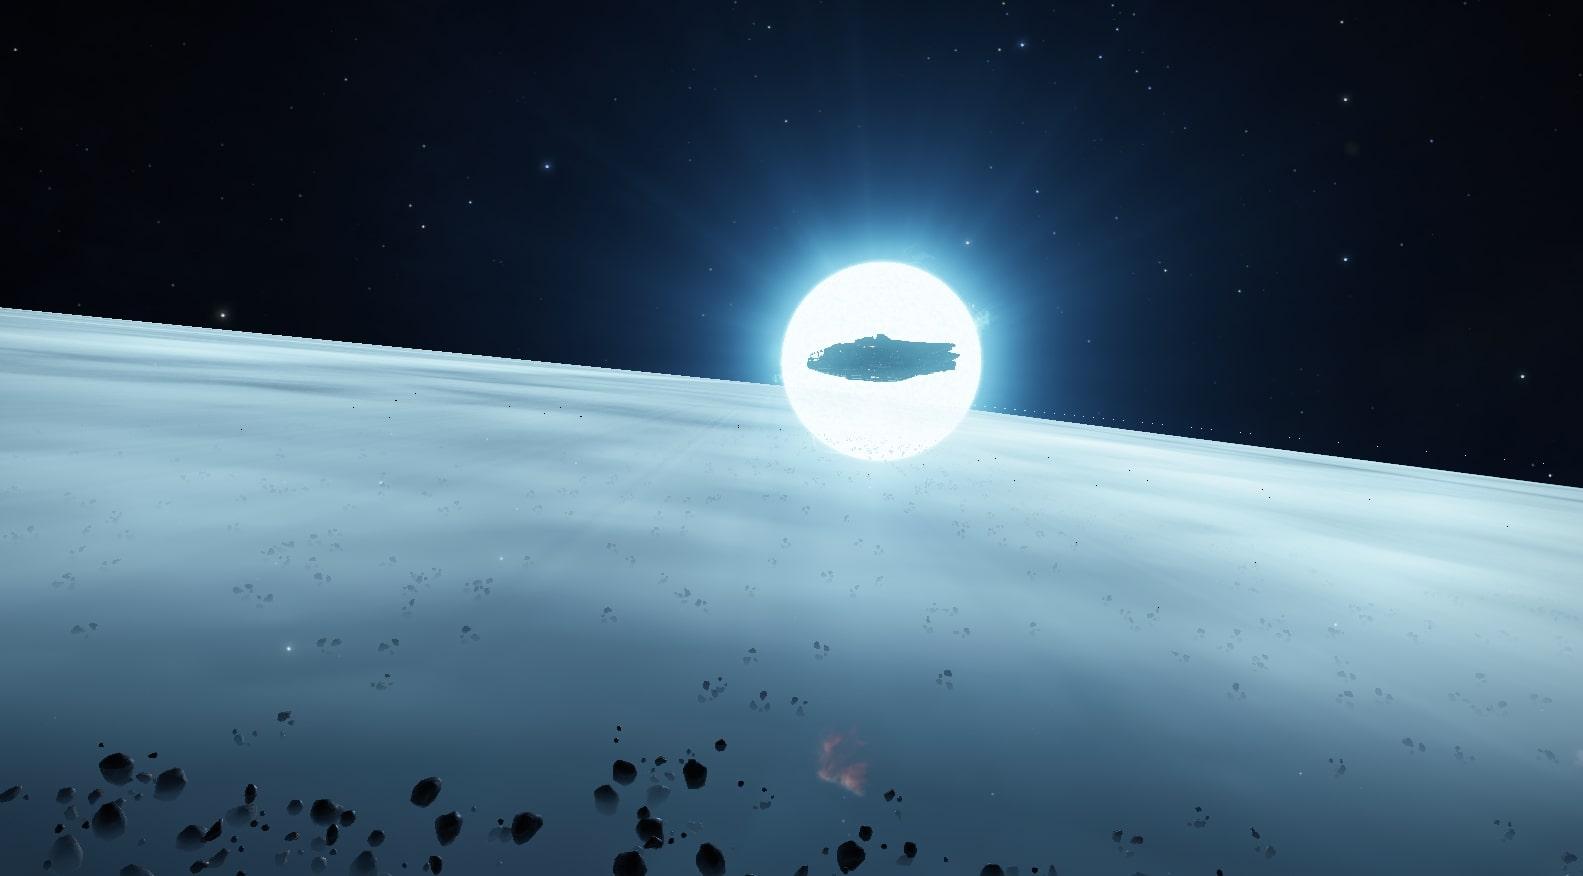 planetrings1.jpg